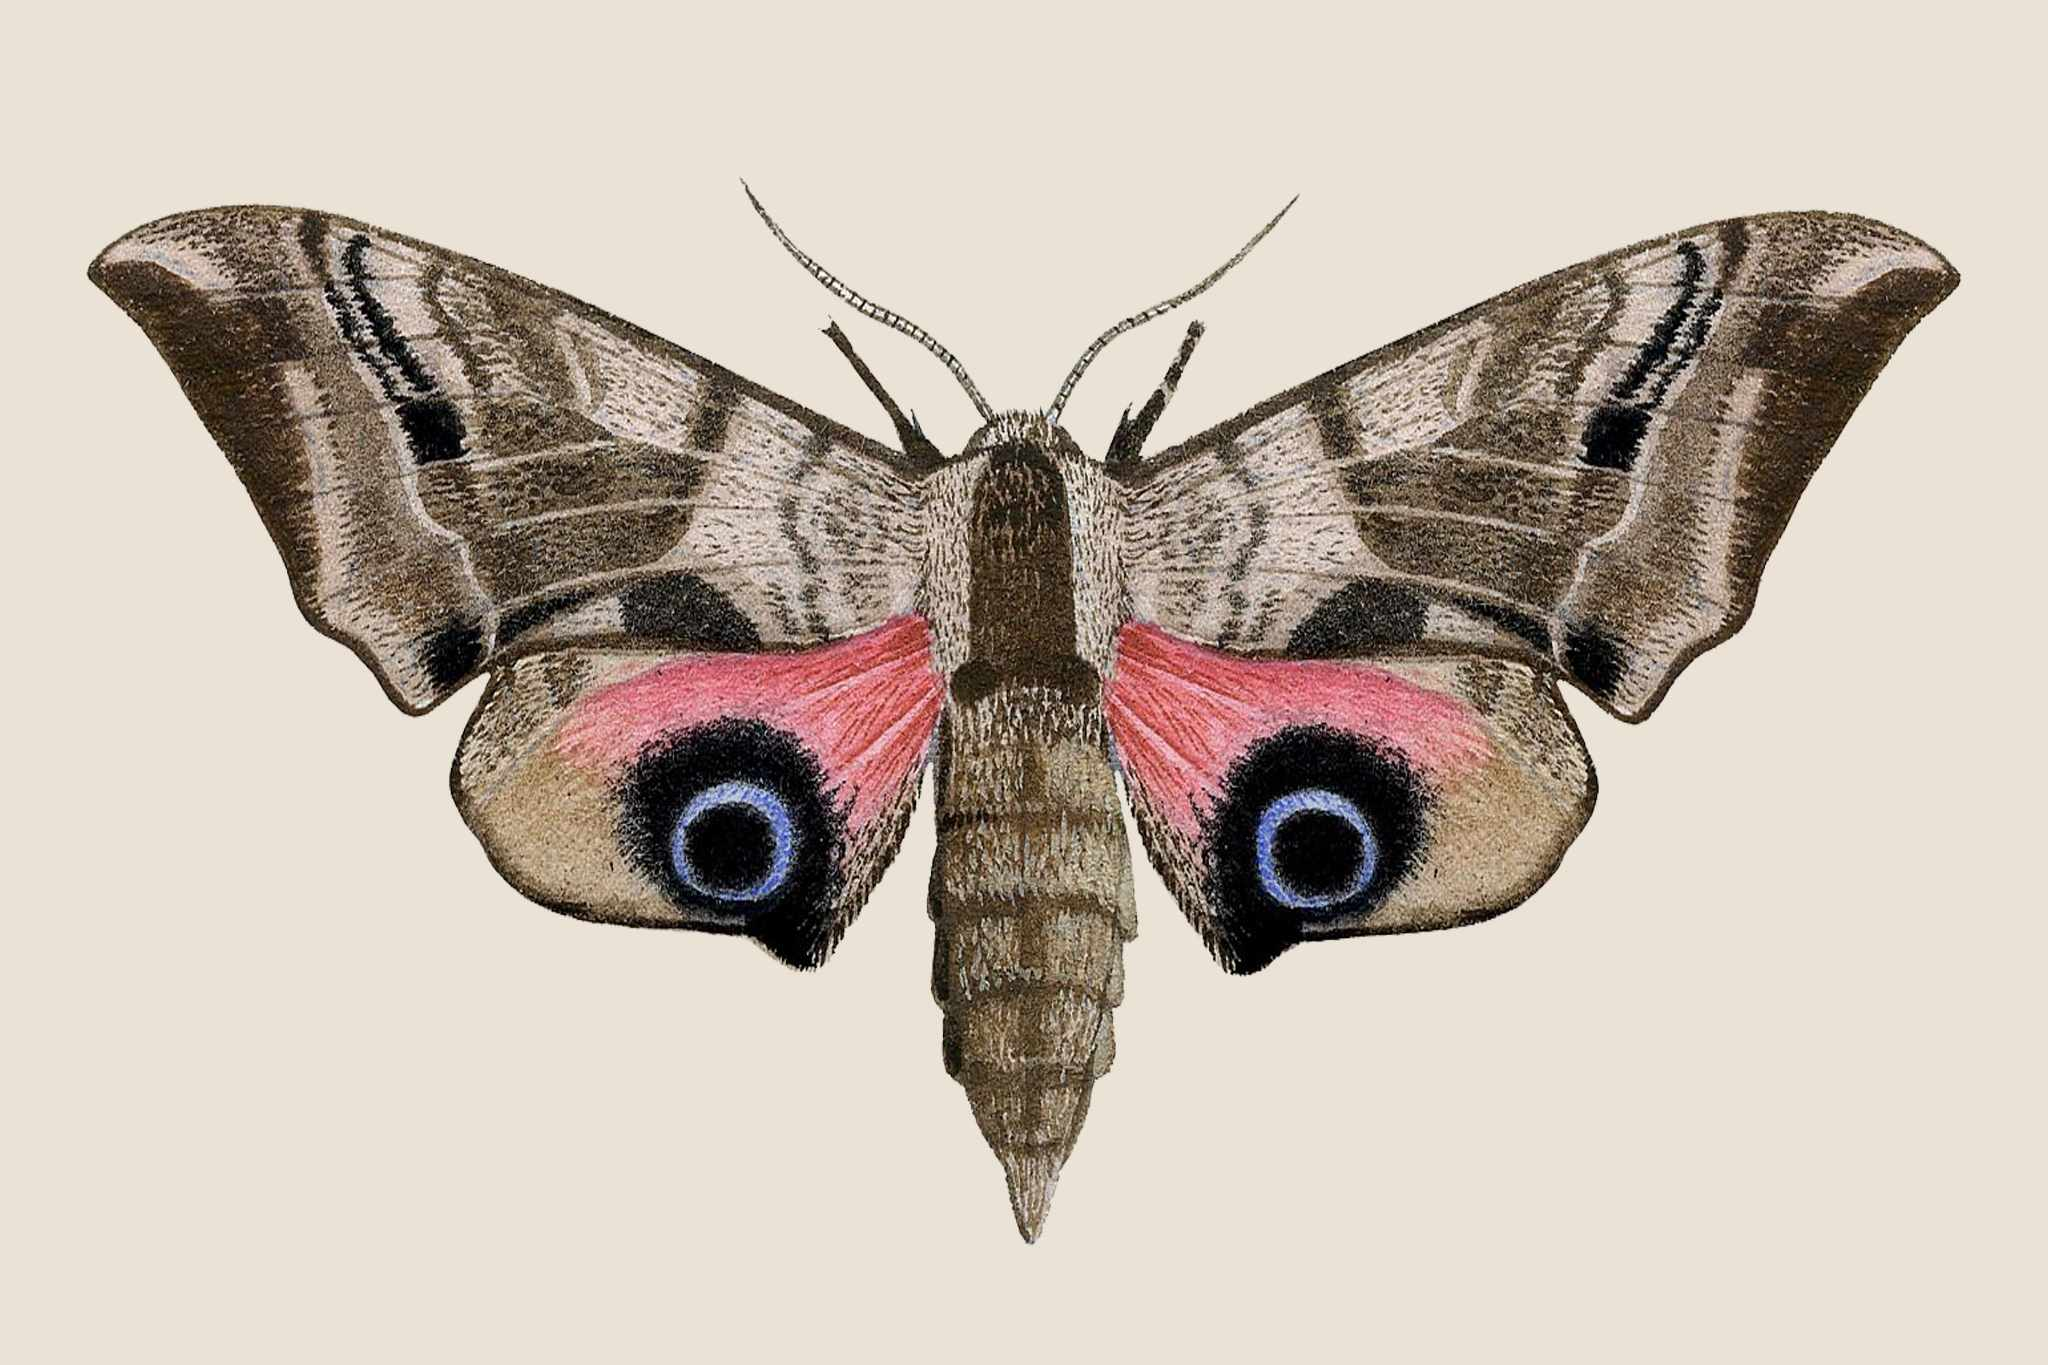 Eyed hawkmoth illustration